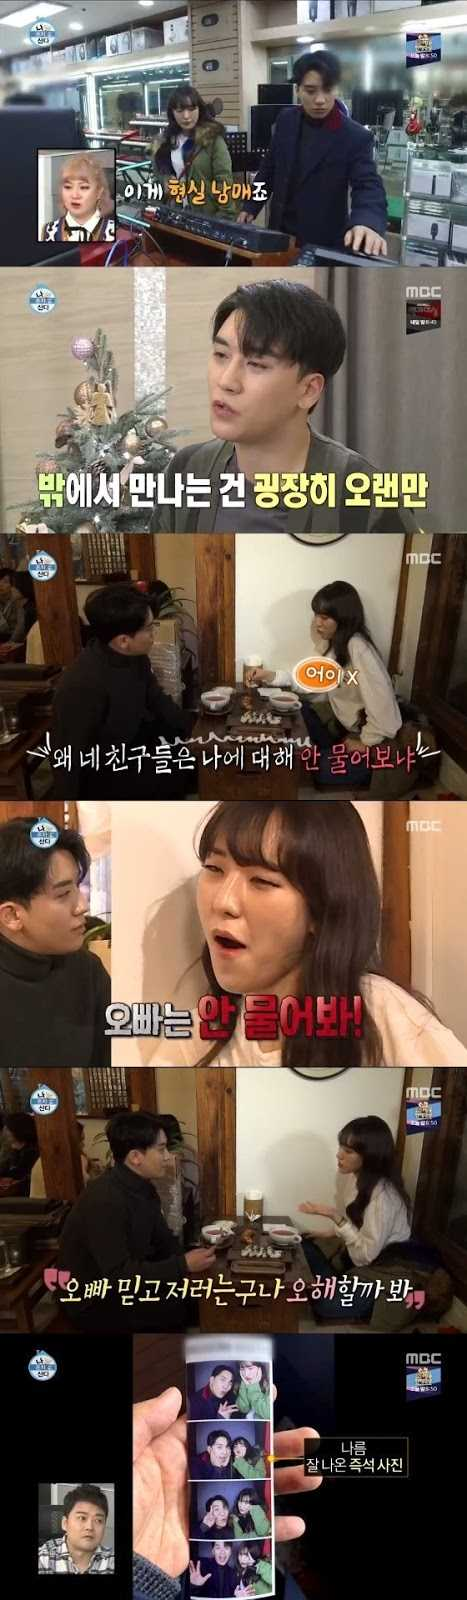 Seungri 'I Live Alone' şovunda kız kardeşiyle zaman geçirdi